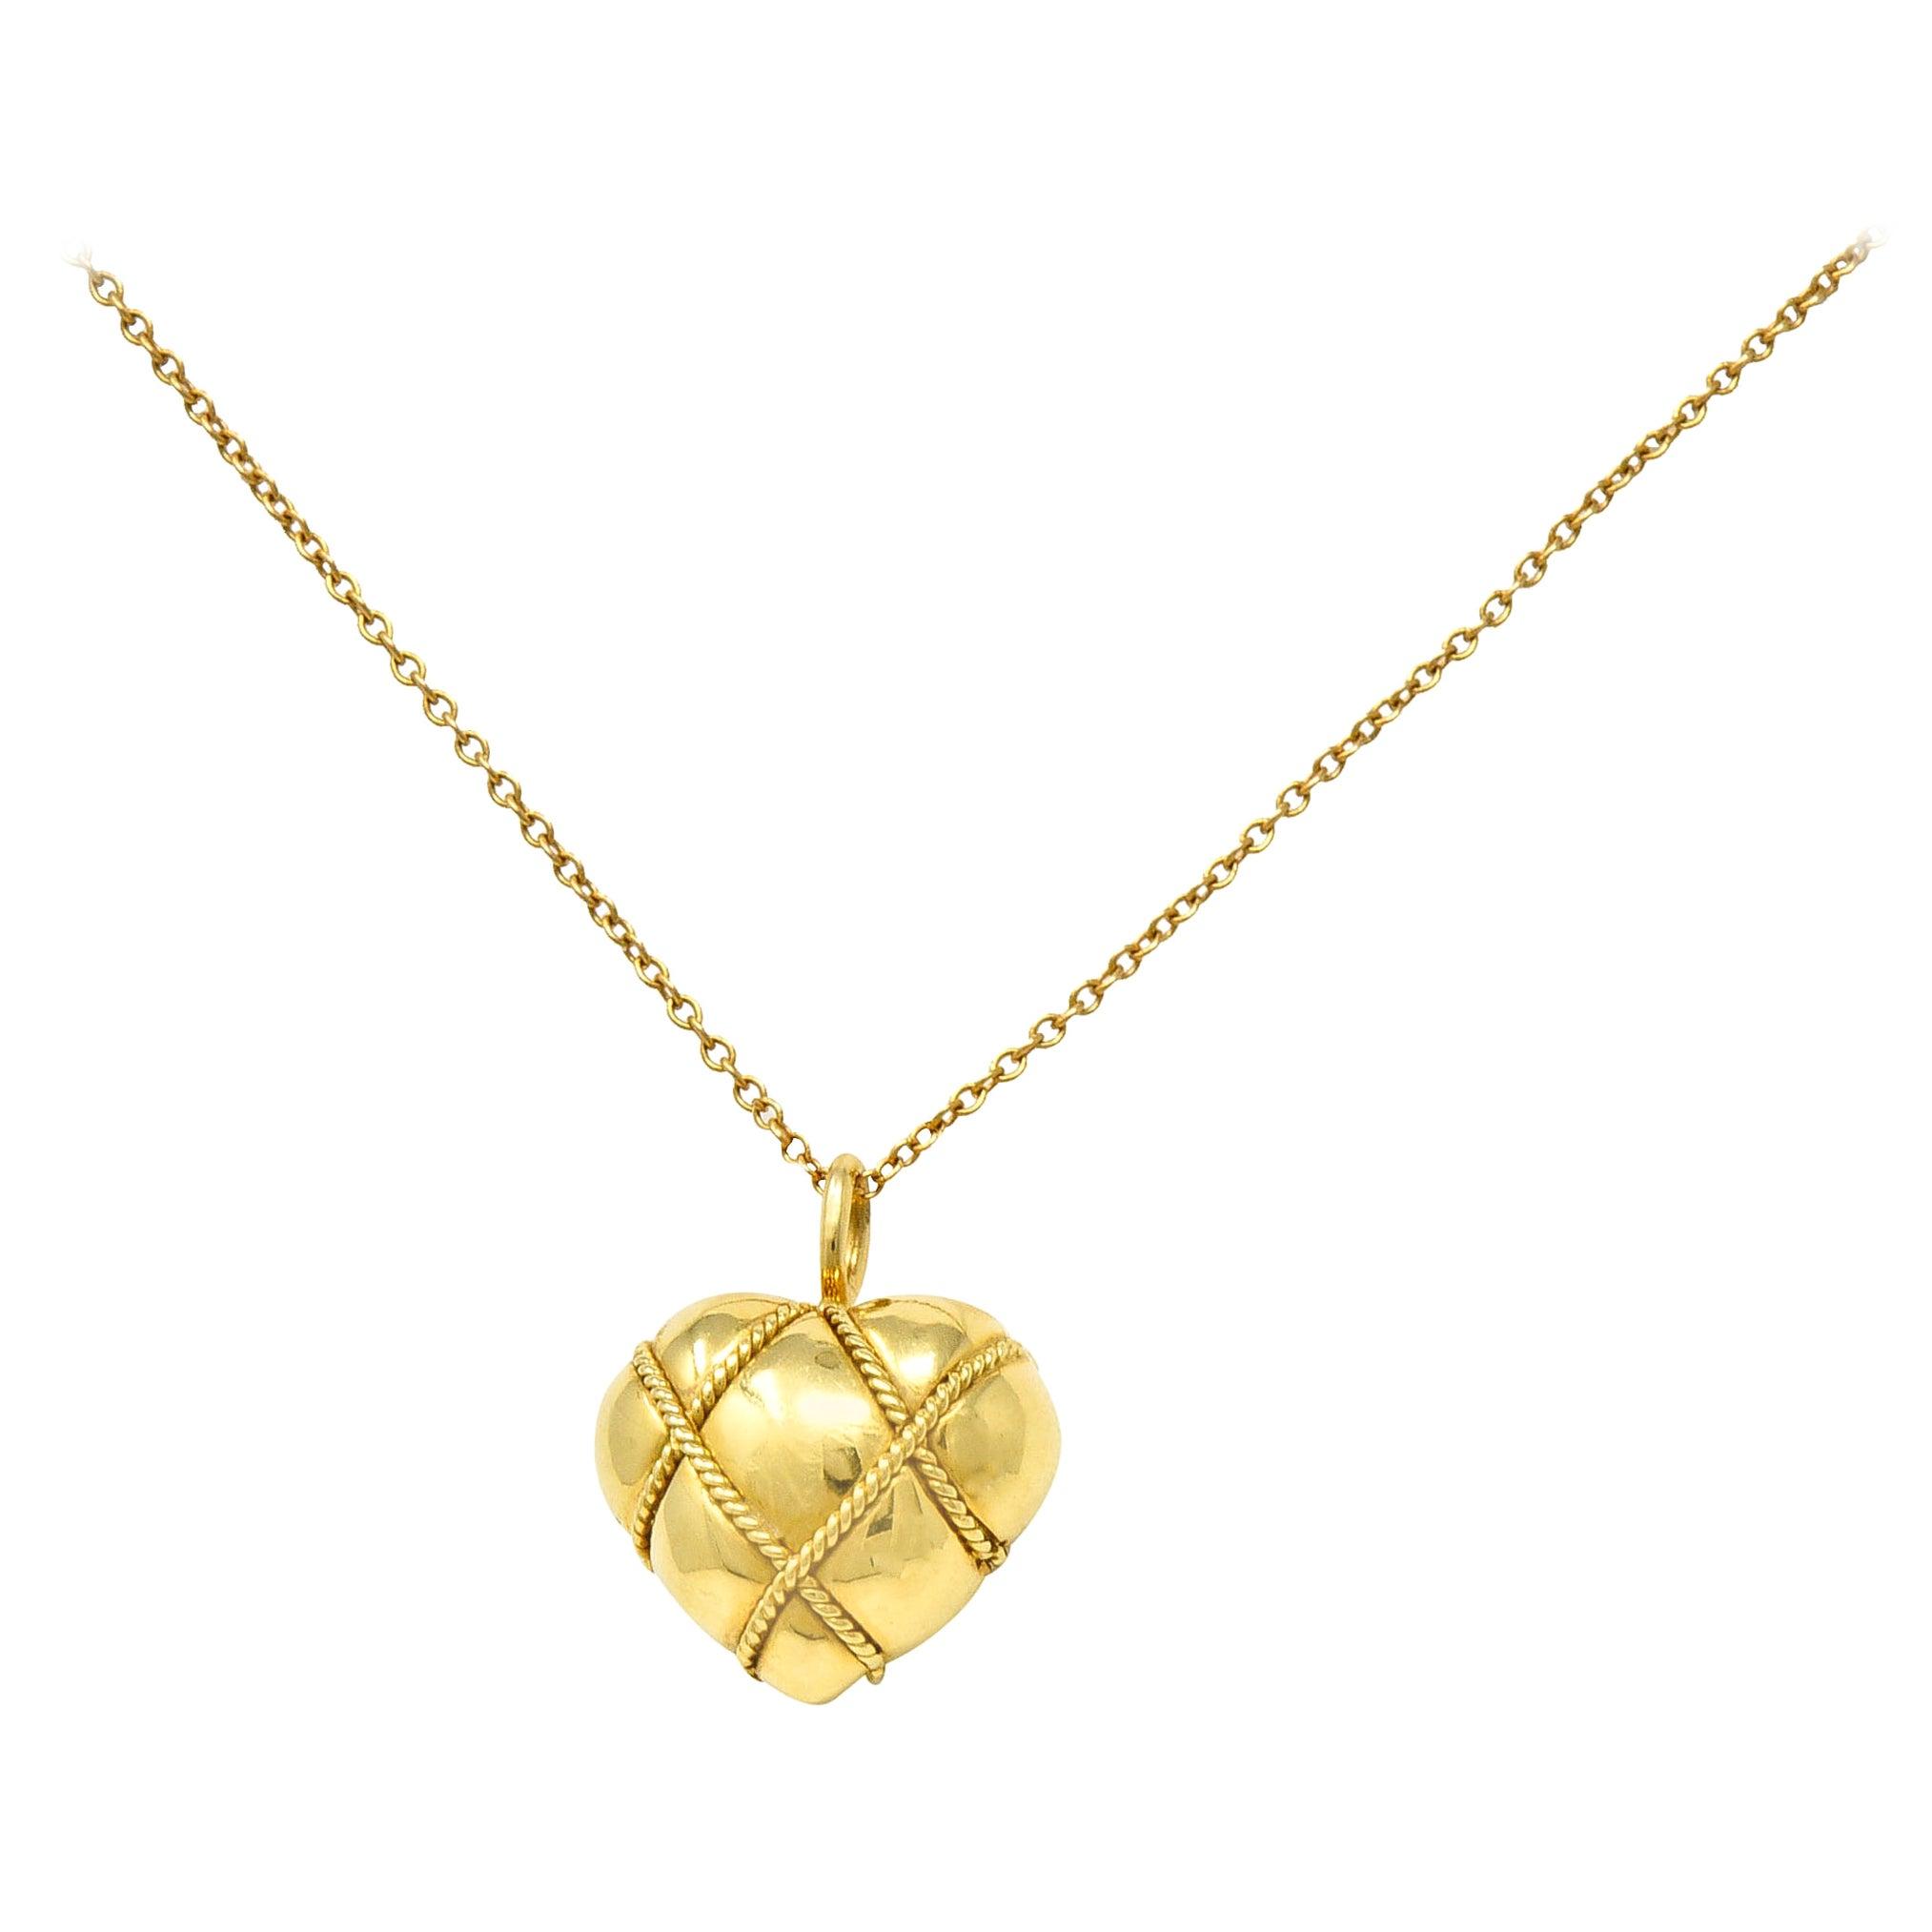 Tiffany & Co. Vintage 18 Karat Gold Cross My Heart Pendant Necklace